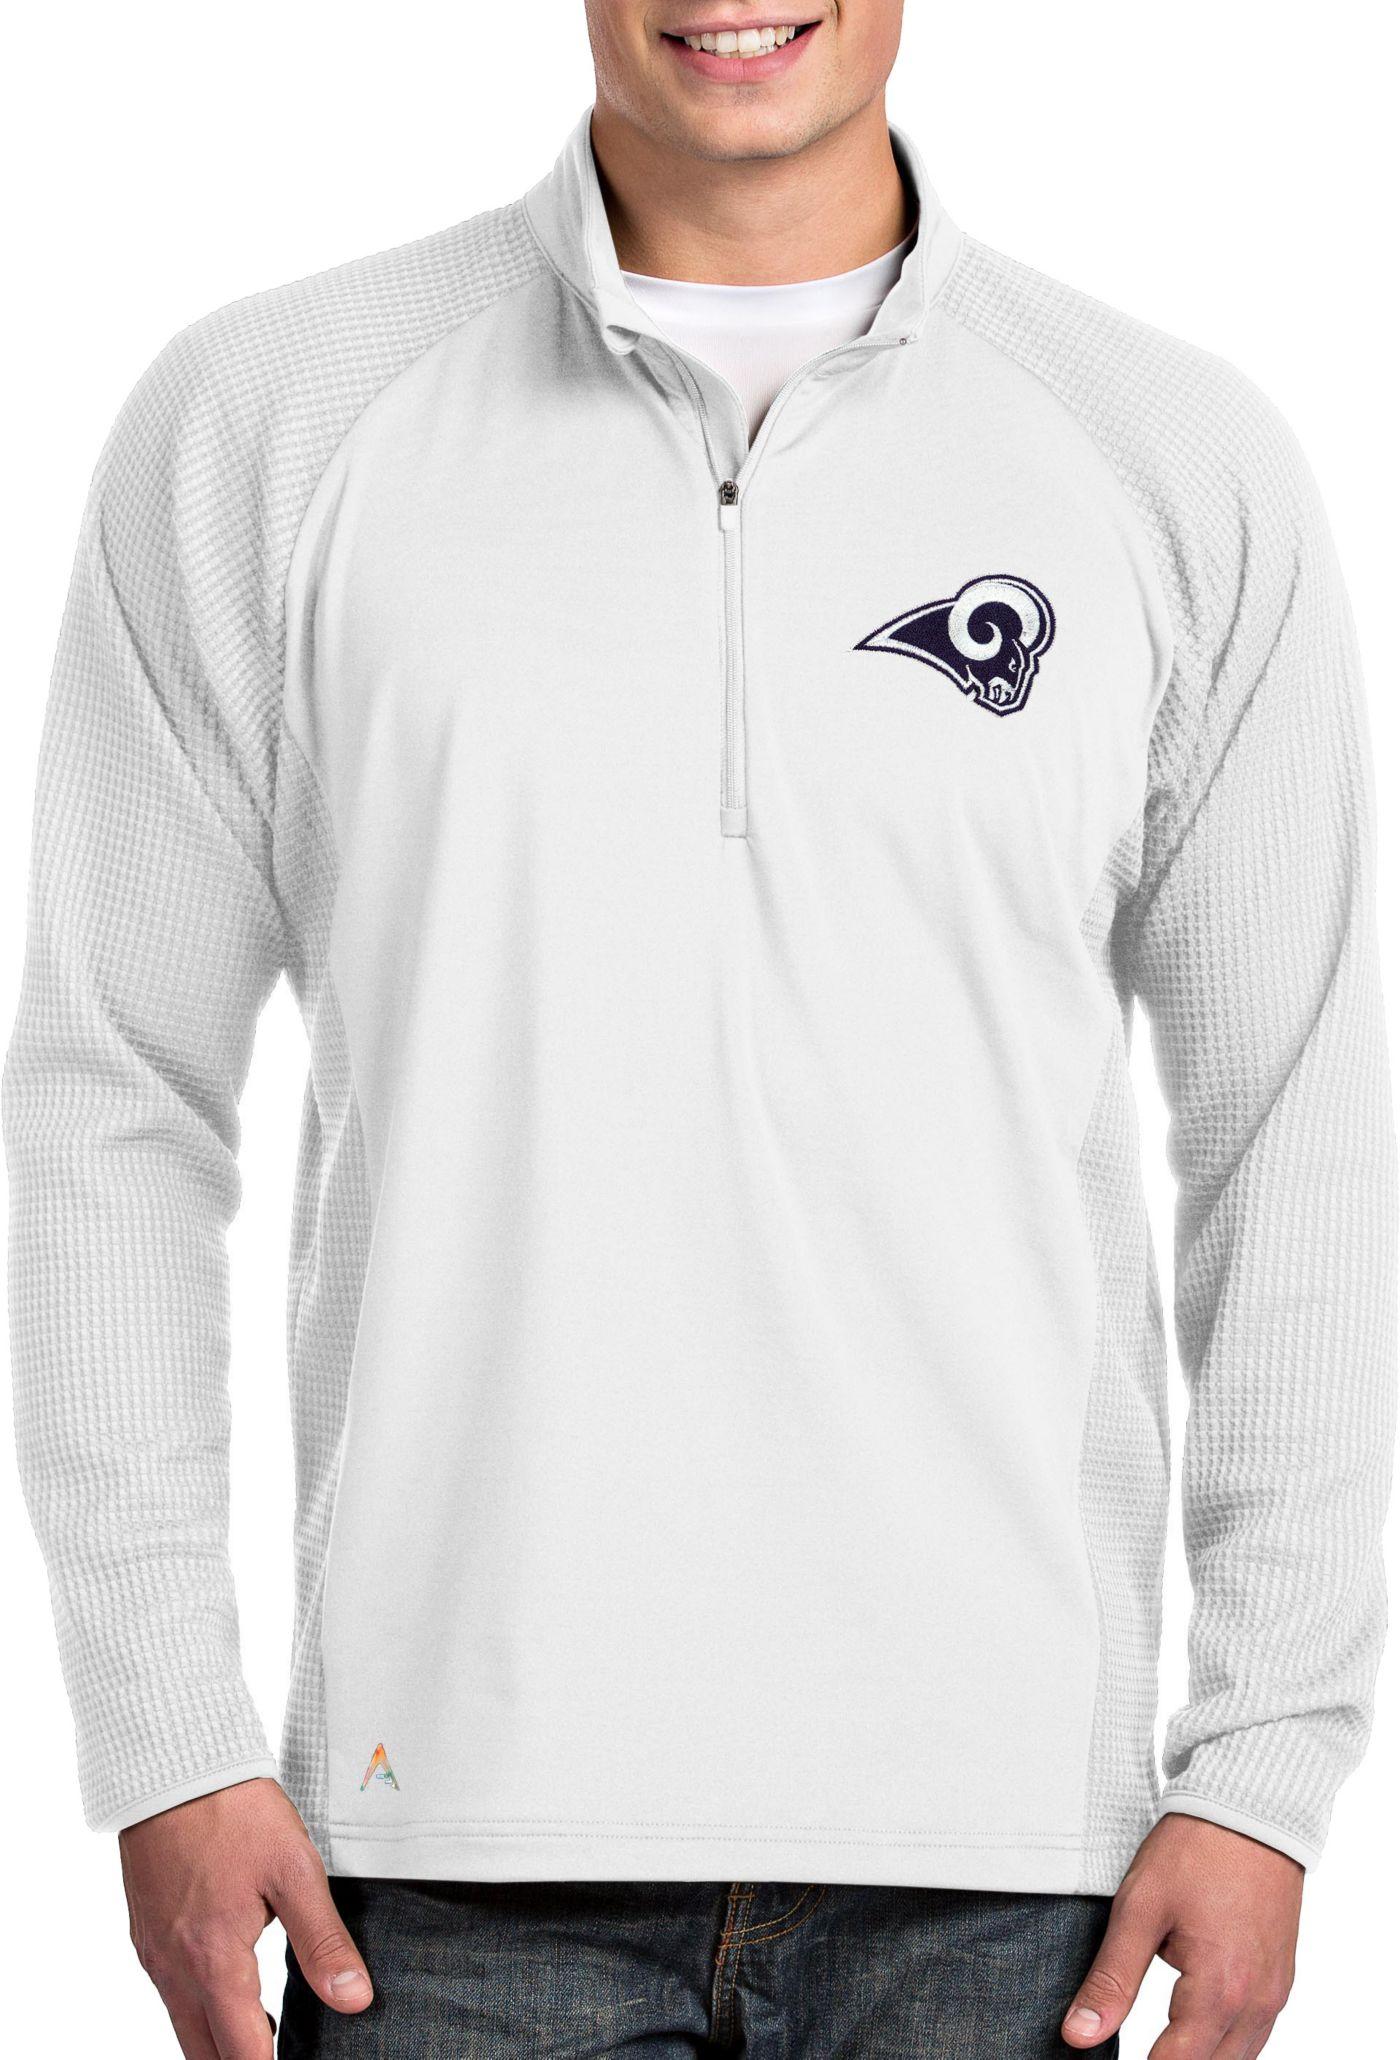 Antigua Men's Los Angeles Rams Sonar White Quarter-Zip Pullover